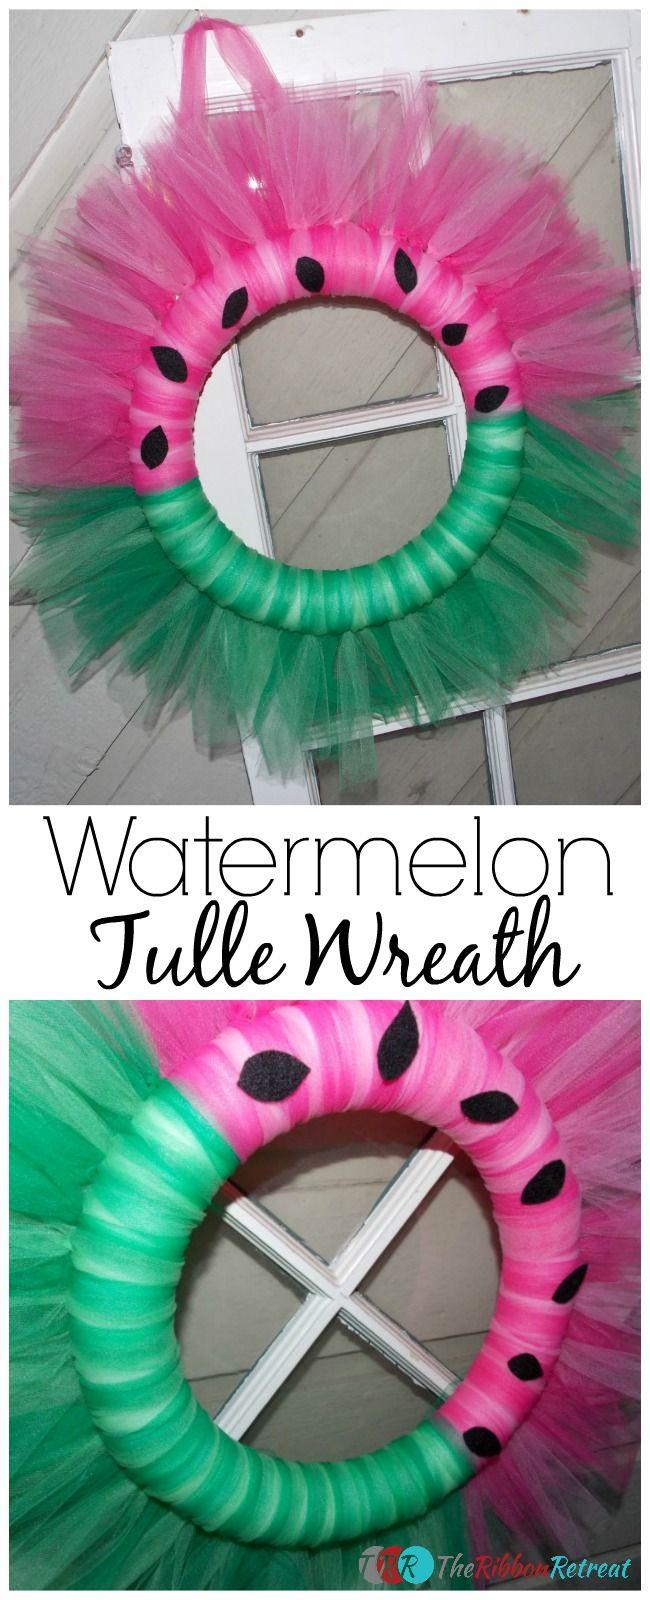 Ribbon wreath tutorial on wire hanger - Watermelon Tulle Wreath The Ribbon Retreat Blog